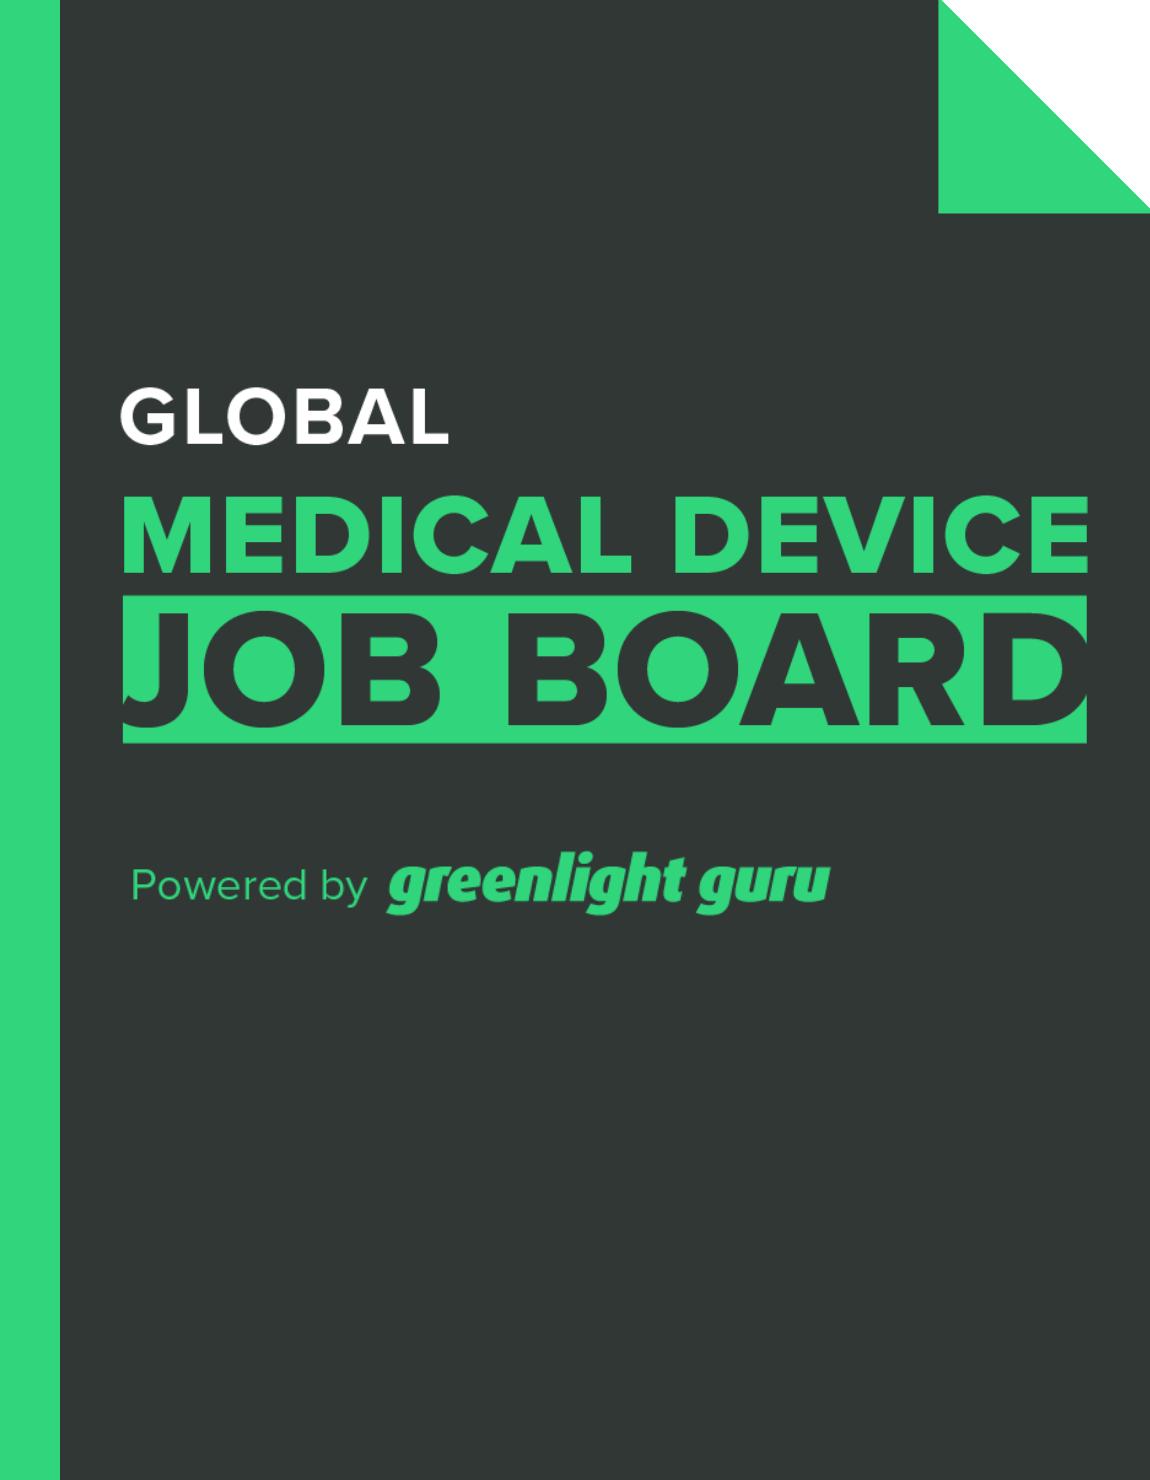 global-medical-device-job-board-greenlight-guru-1